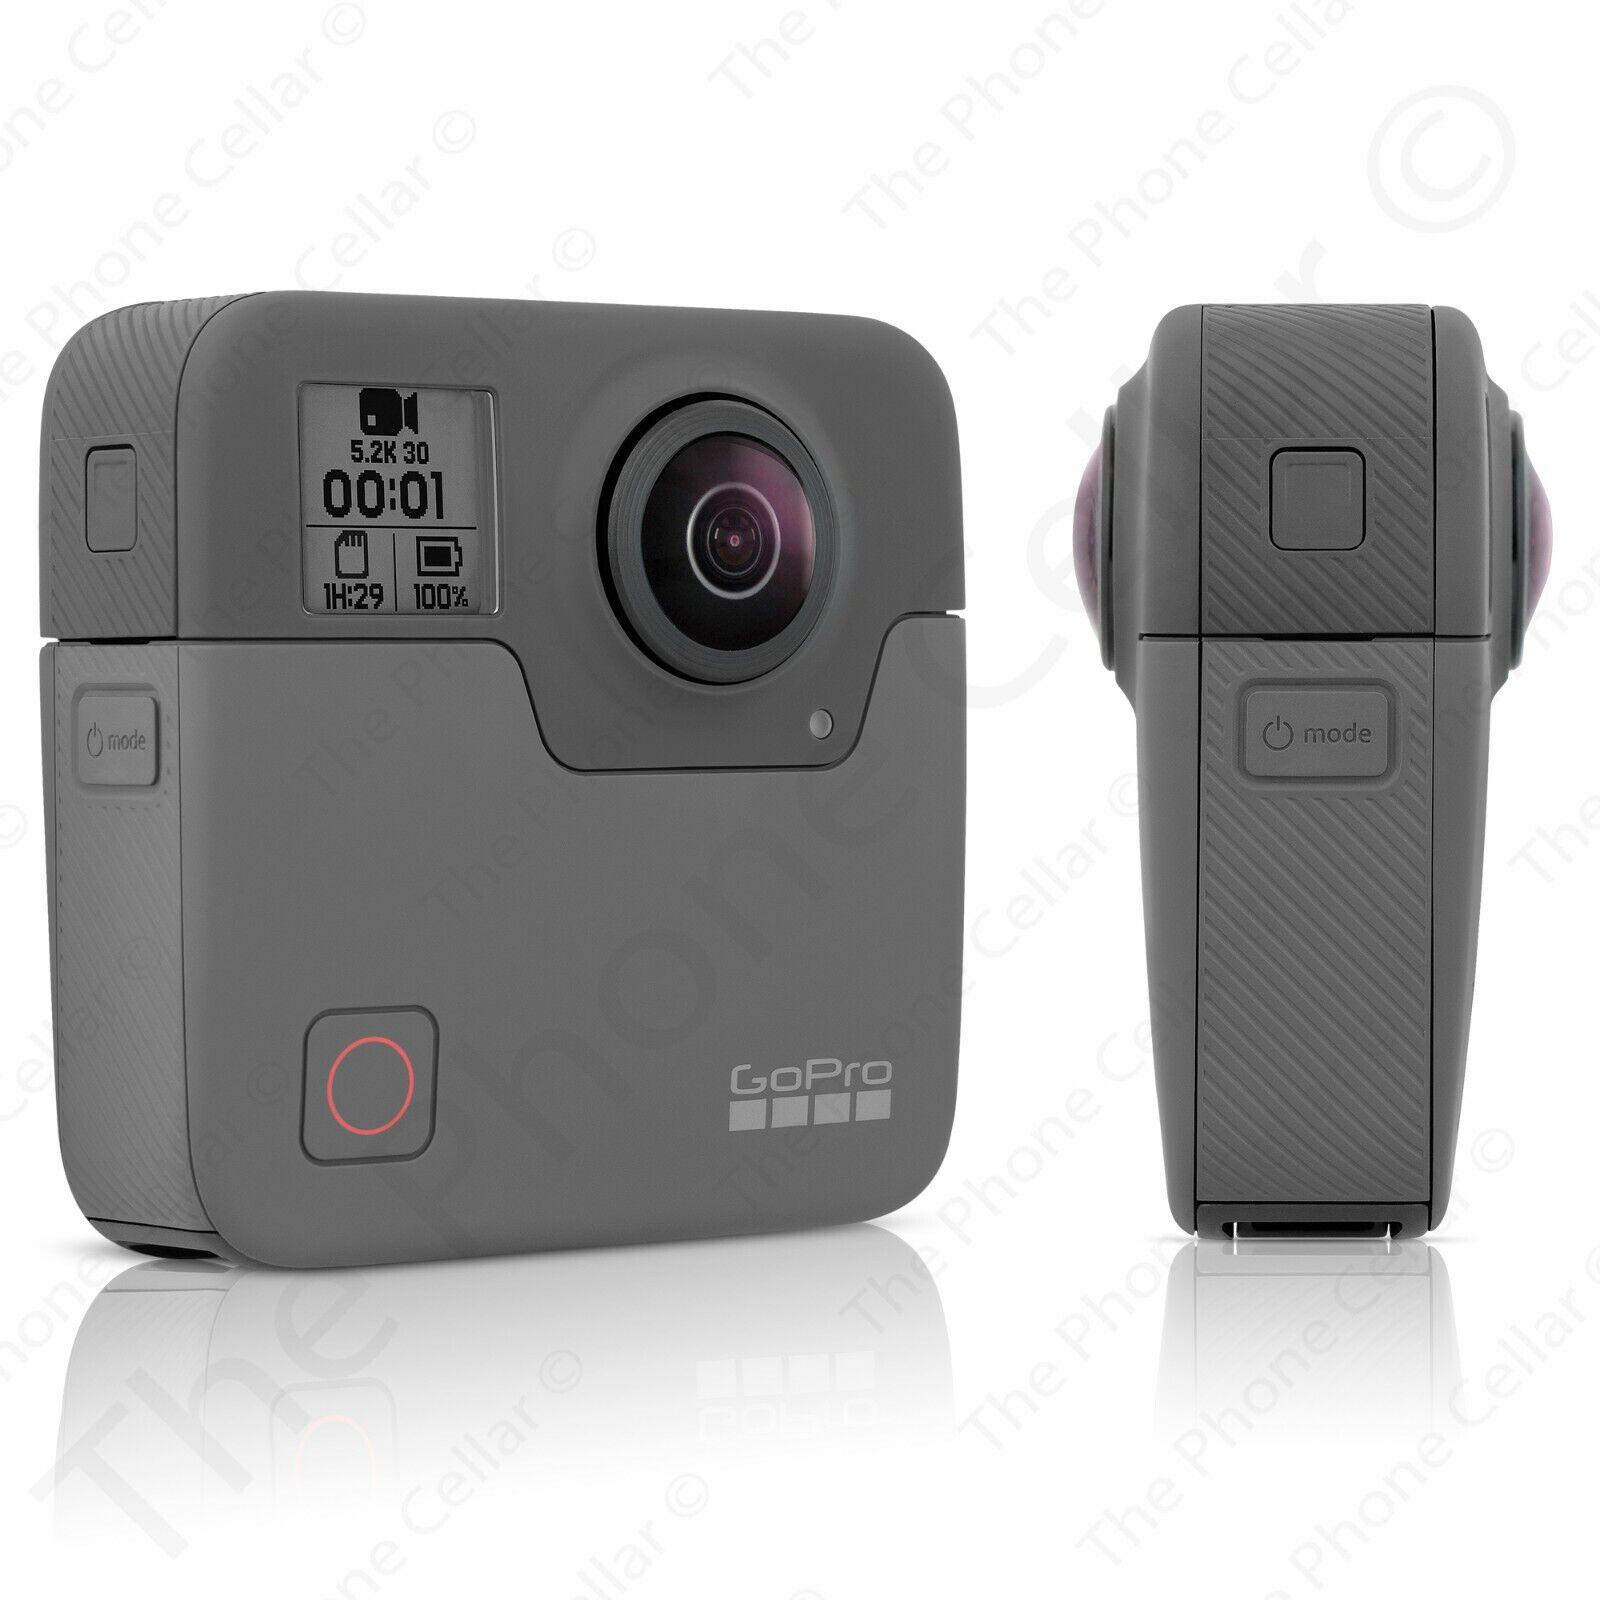 Details about GoPro - Fusion 360-Degree Digital Camera (Black) Scratched  Both Lenses